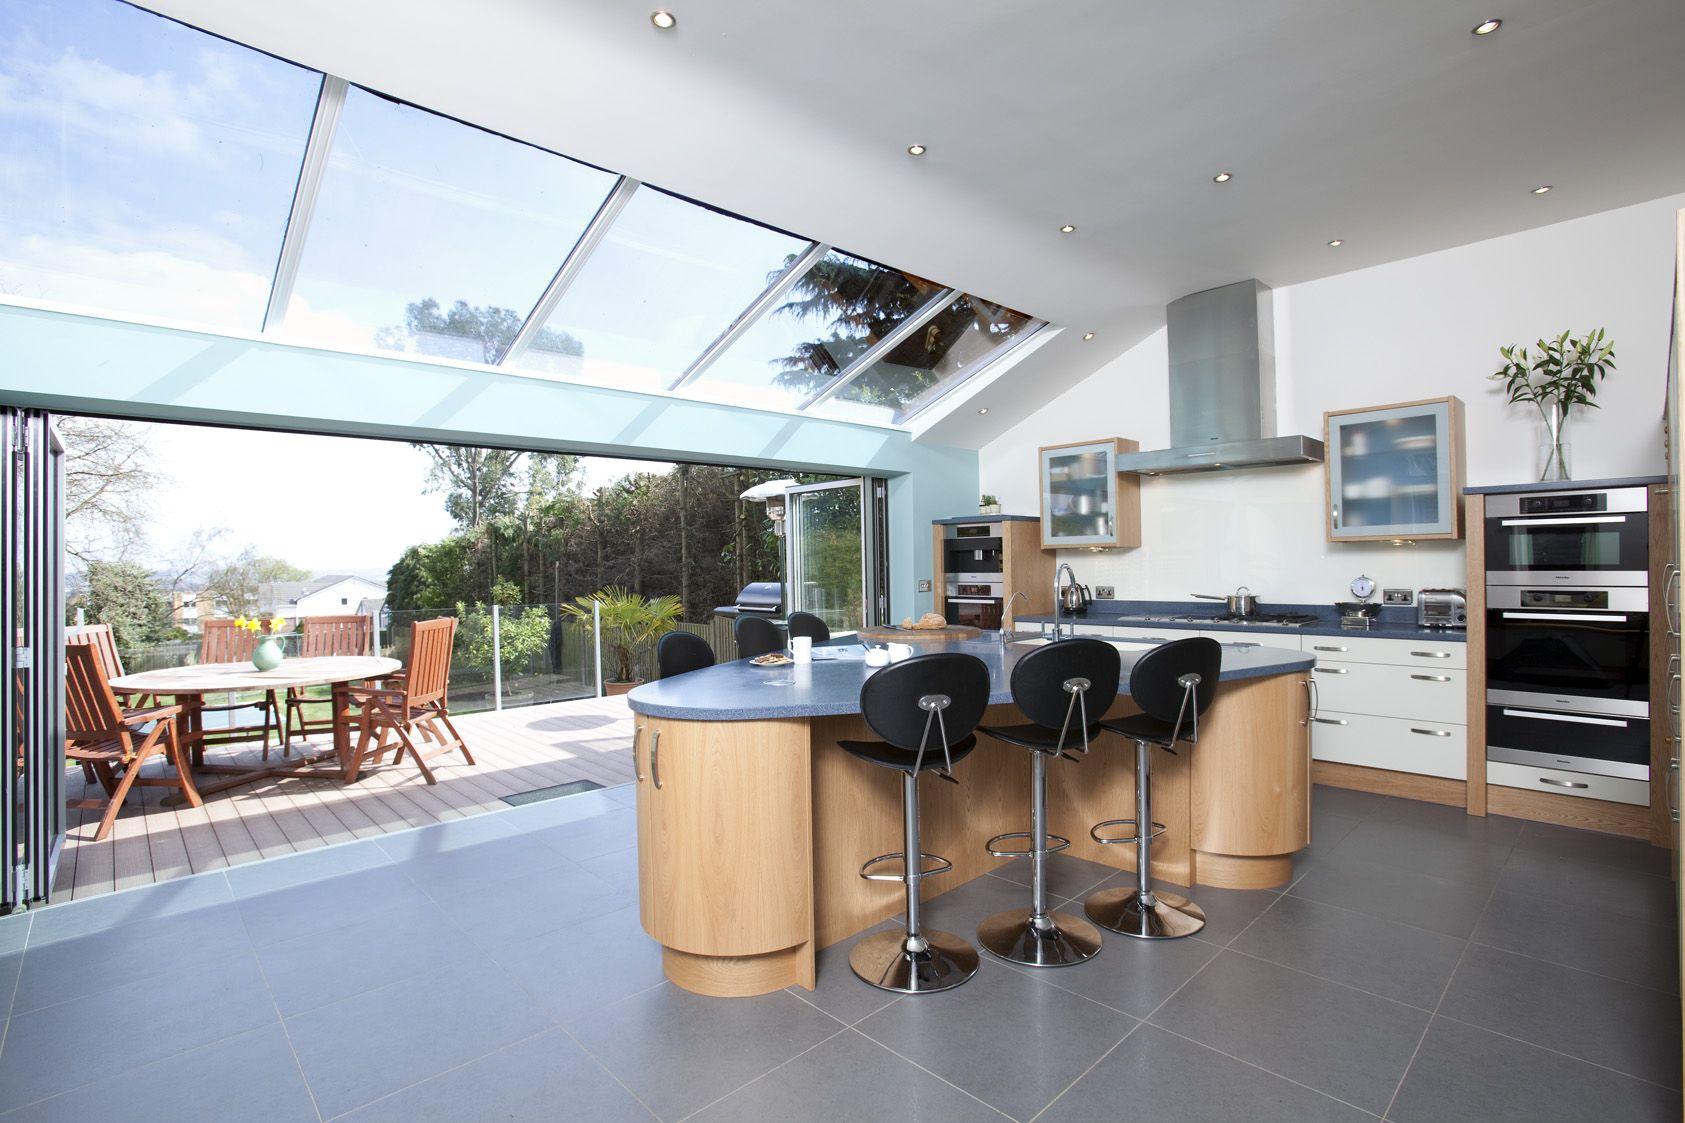 open plan kitchen to outdoor area perfect layout entertaining area